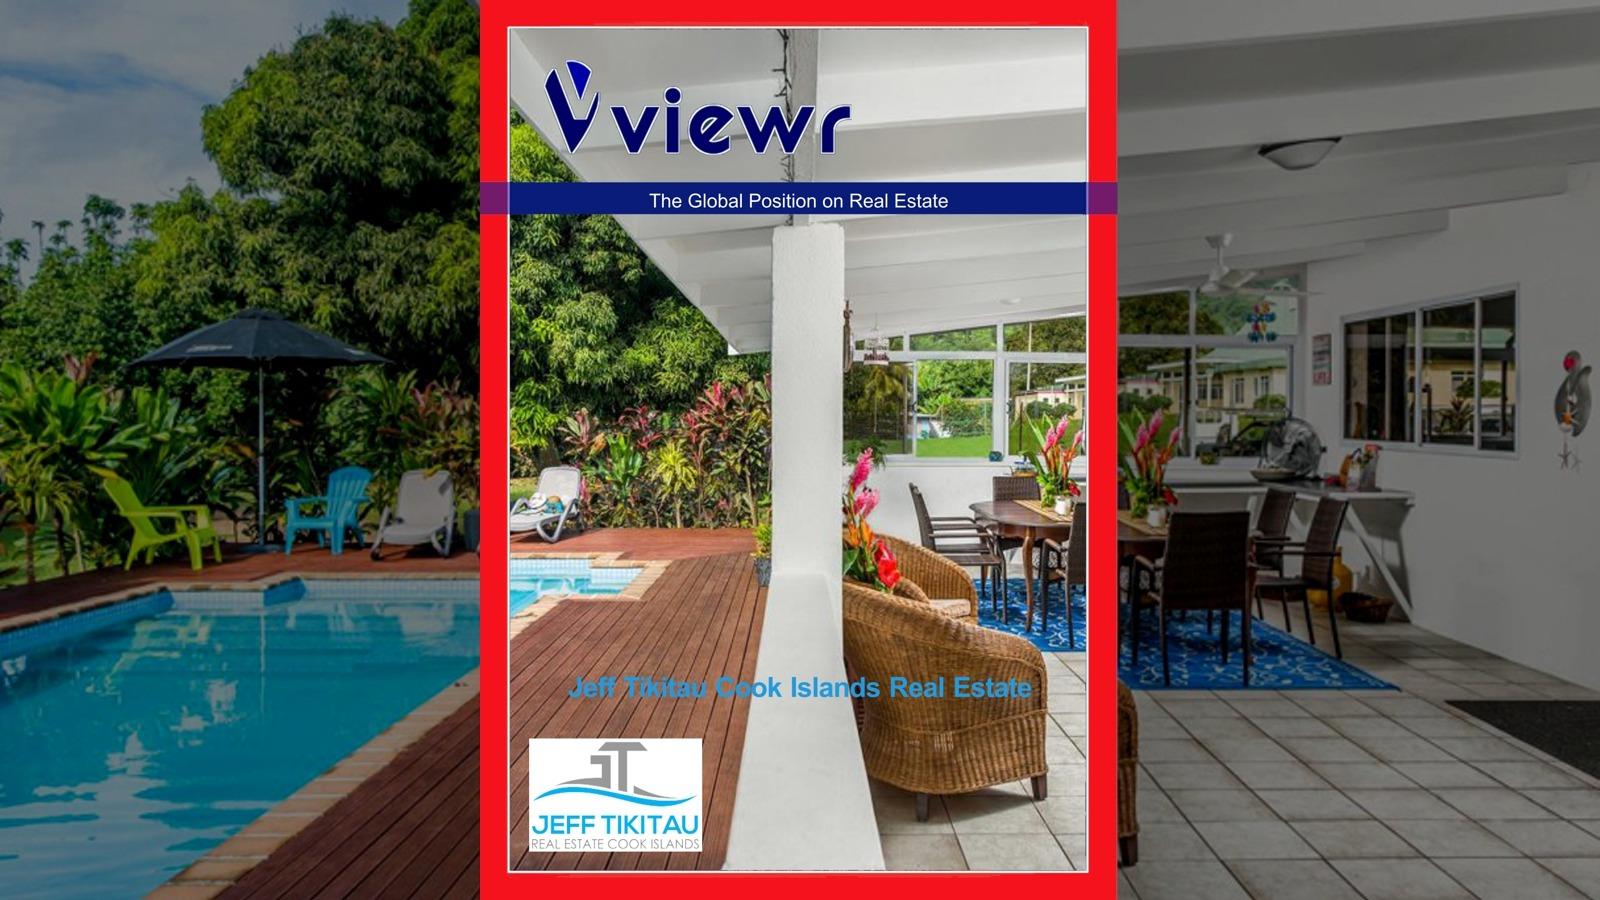 Global viewr Magazine Jeff Tikitau Cook Islands Real Estate 2